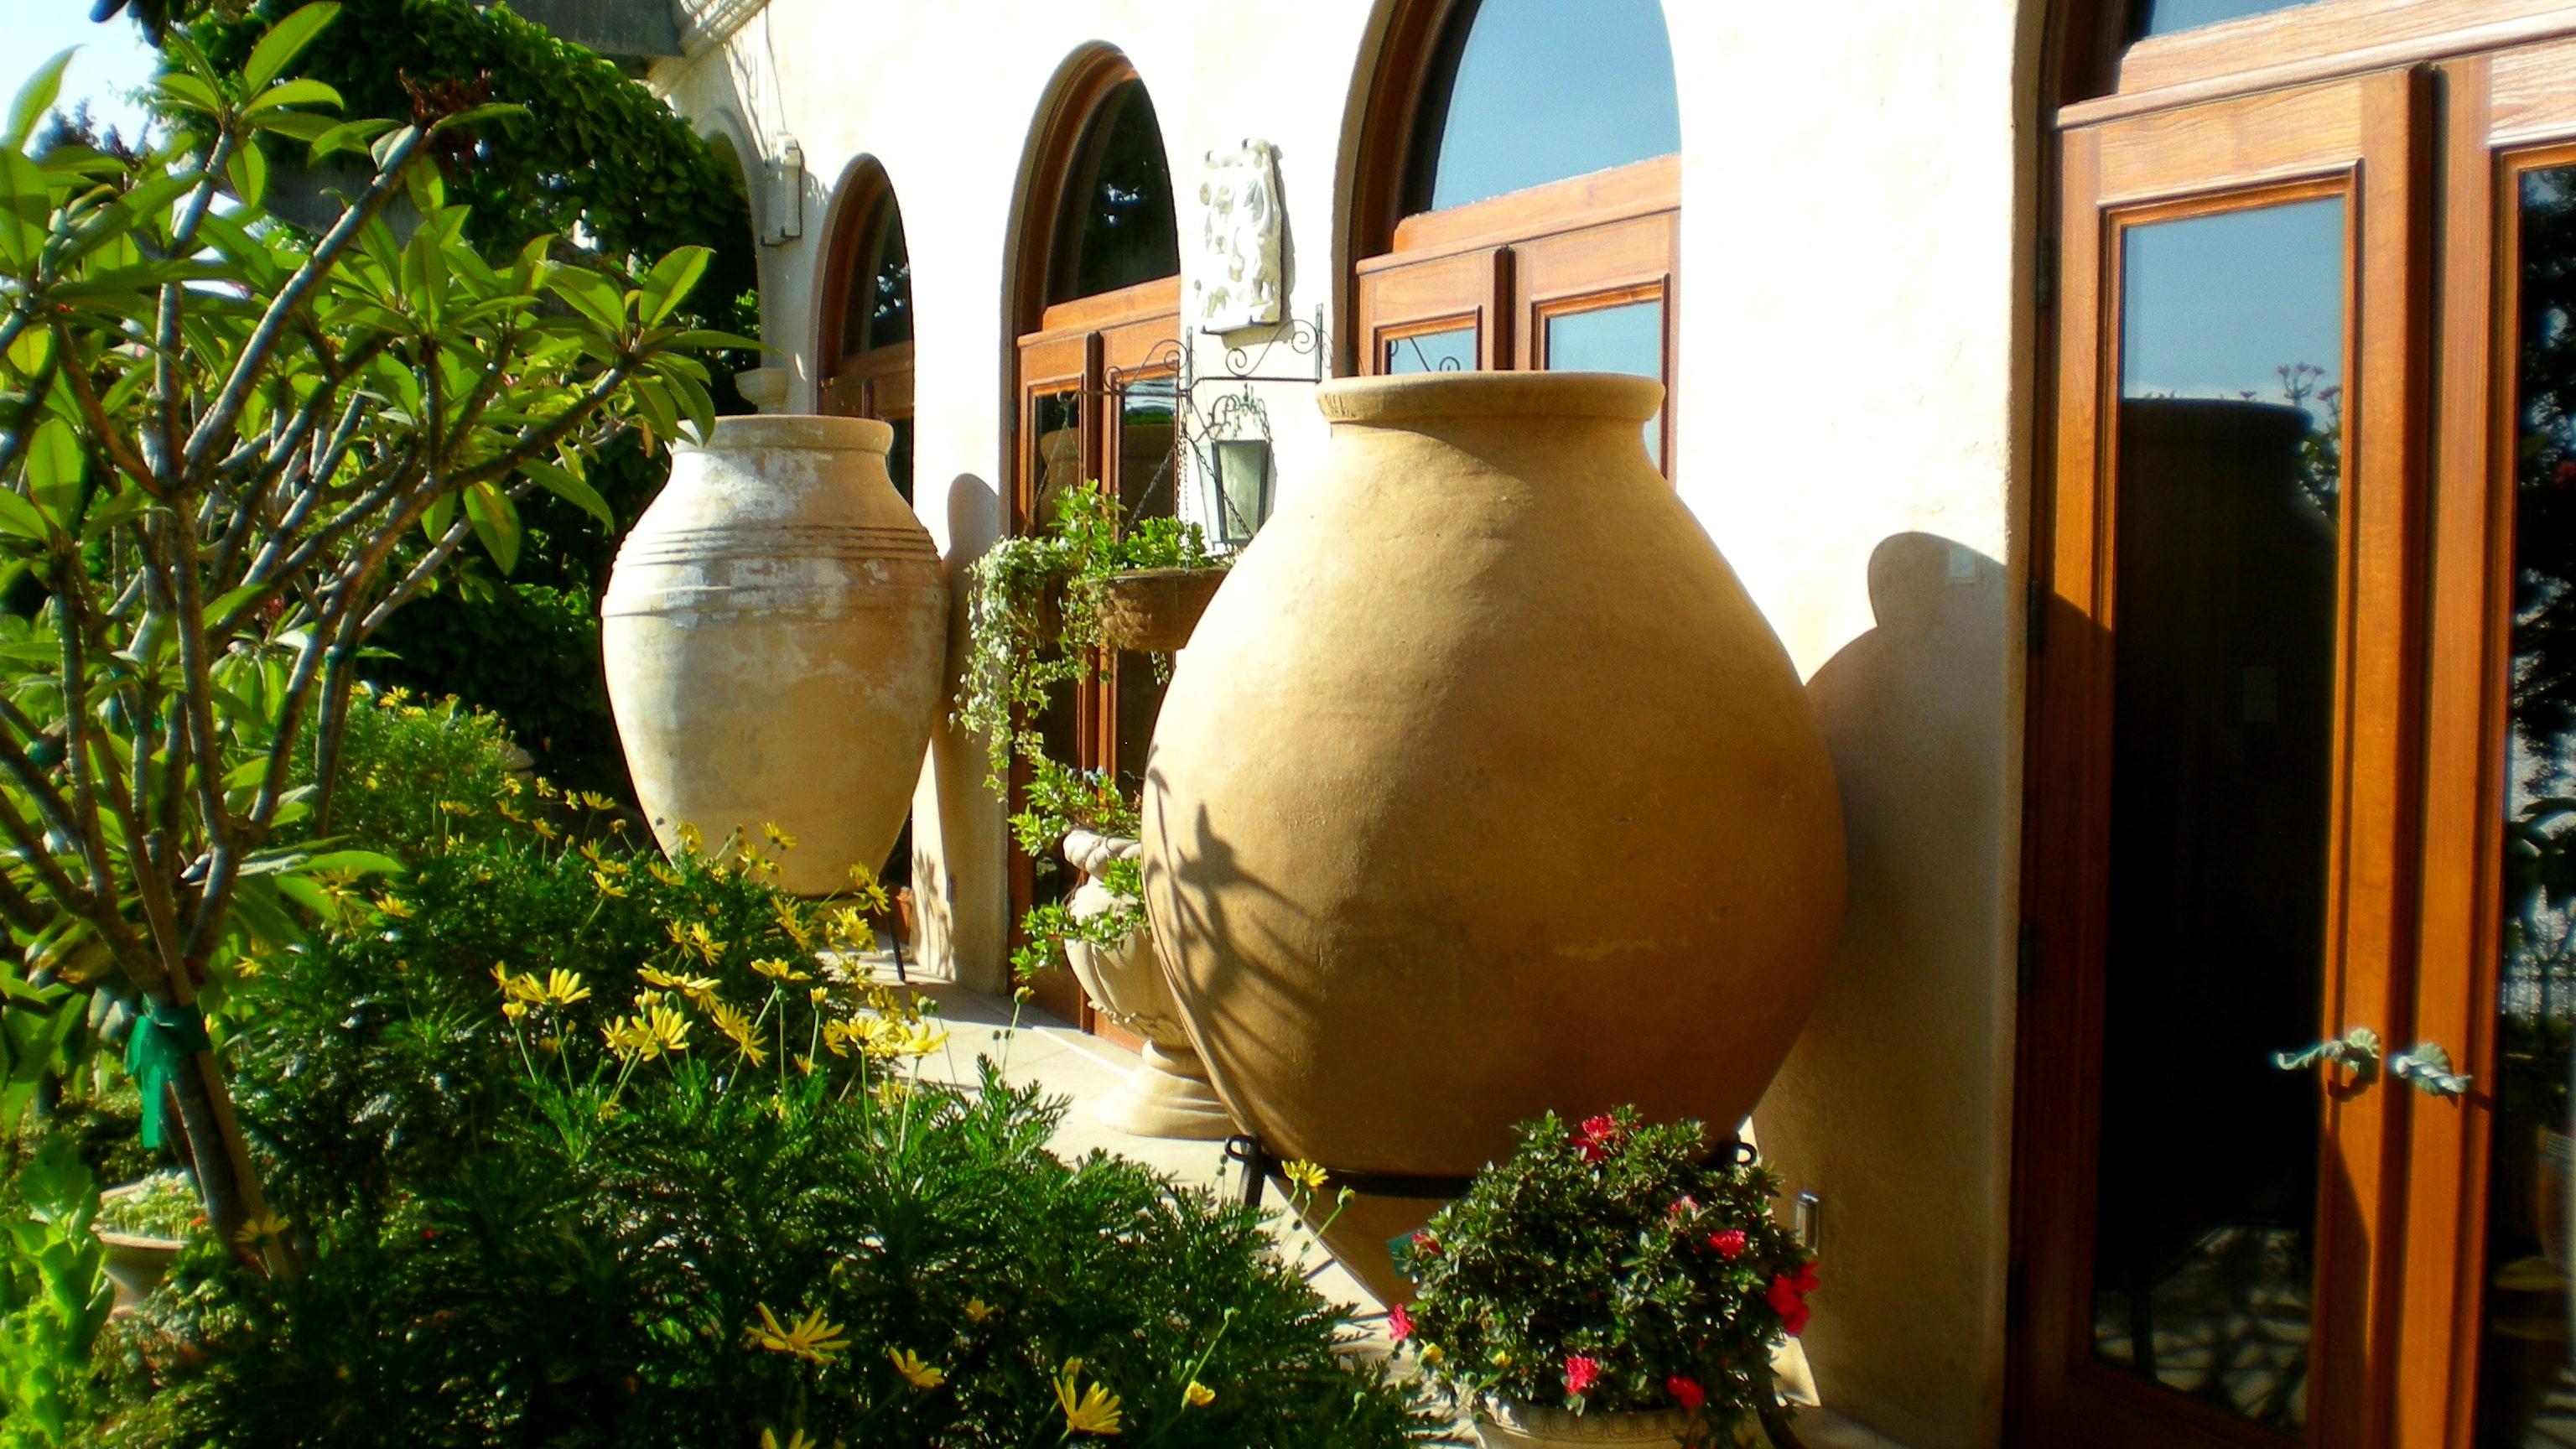 Reused Ancient European Pot